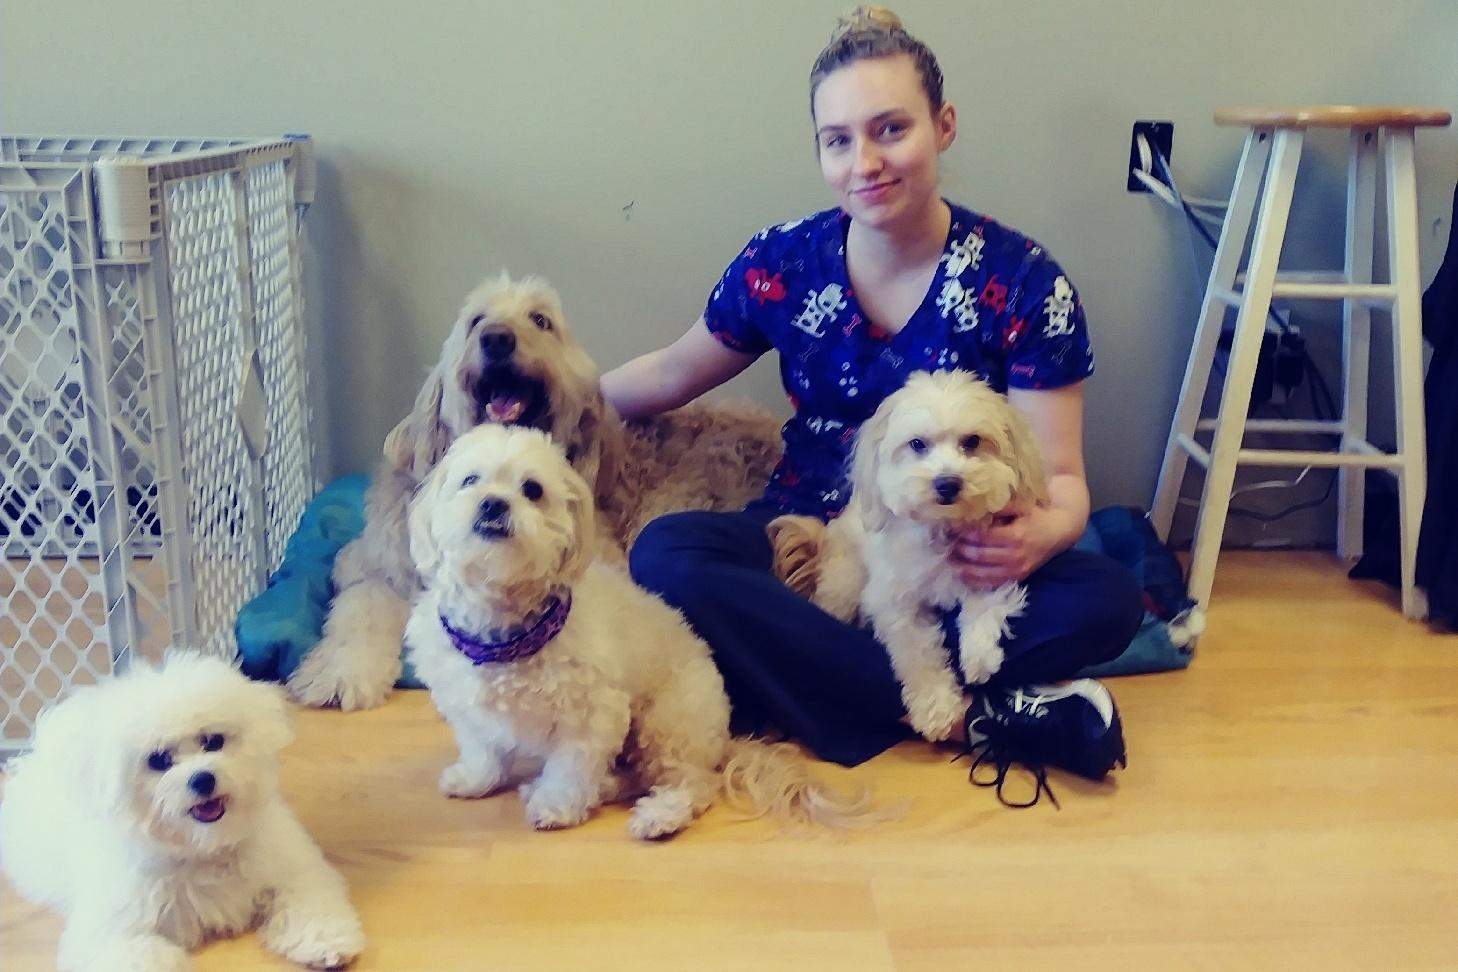 https://0201.nccdn.net/1_2/000/000/142/321/pile-o--dogs-1458x972.jpg